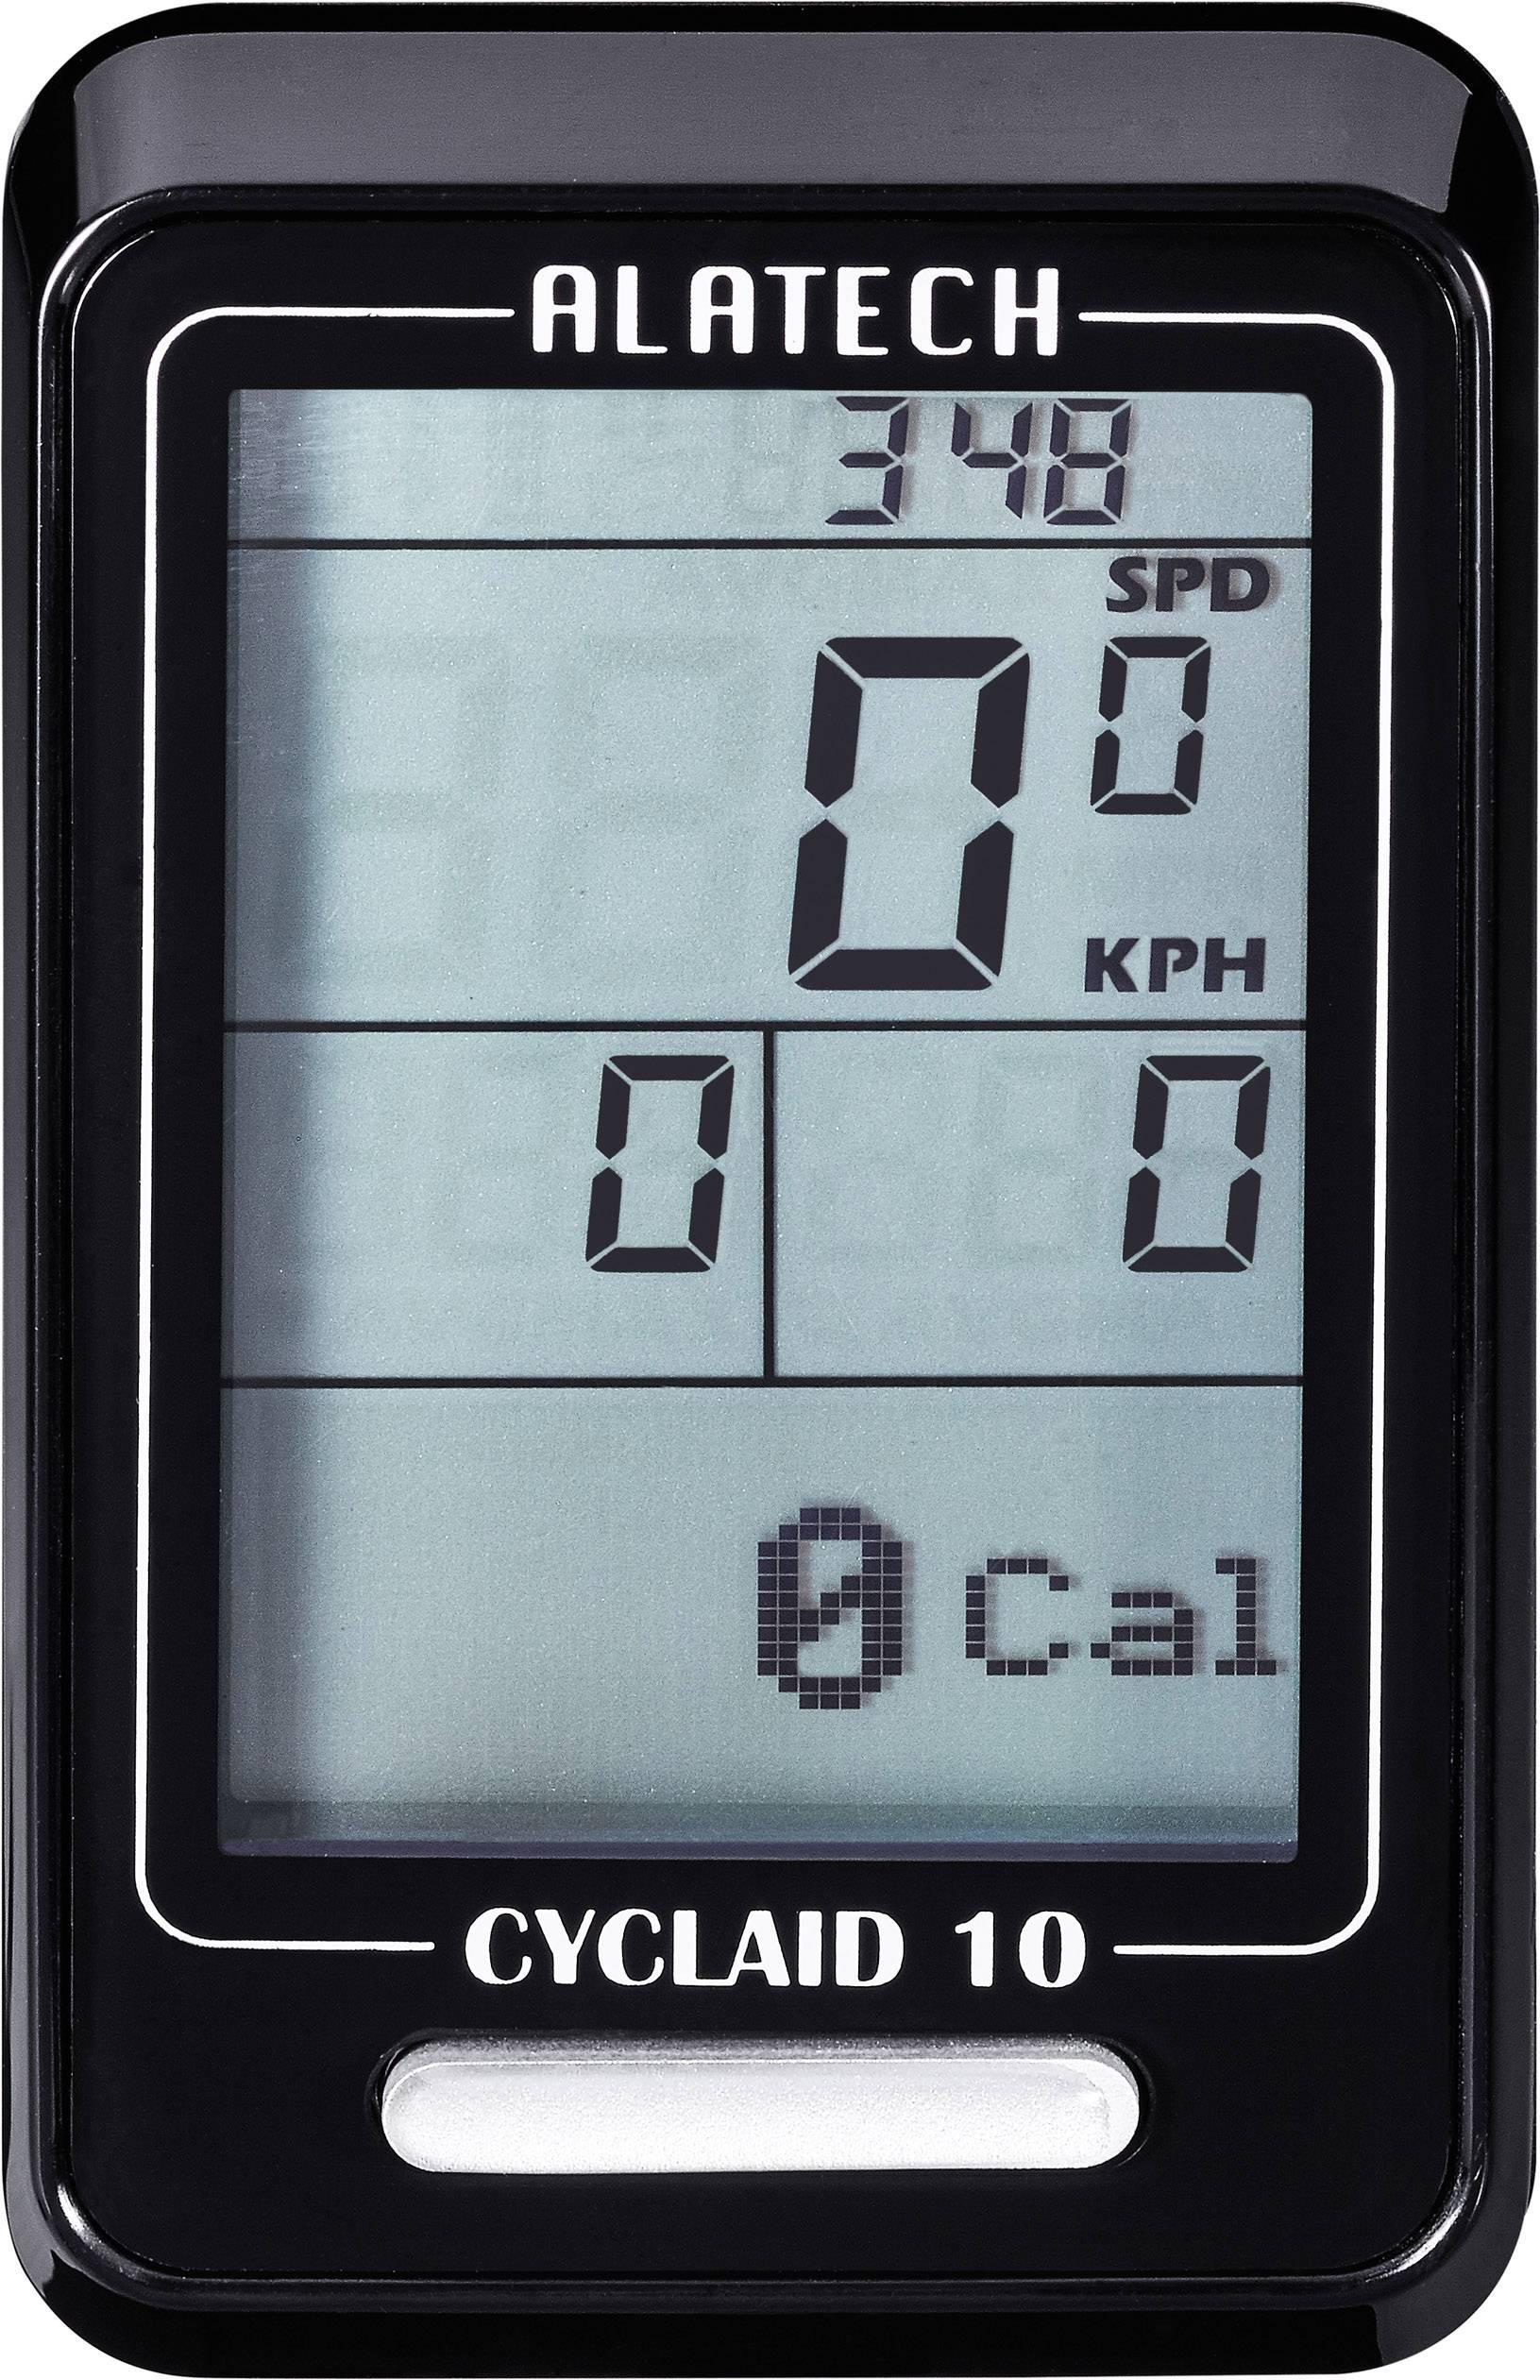 Bezkáblový cyklocomputer Alatech Cyclaid 10 s Bluetooth